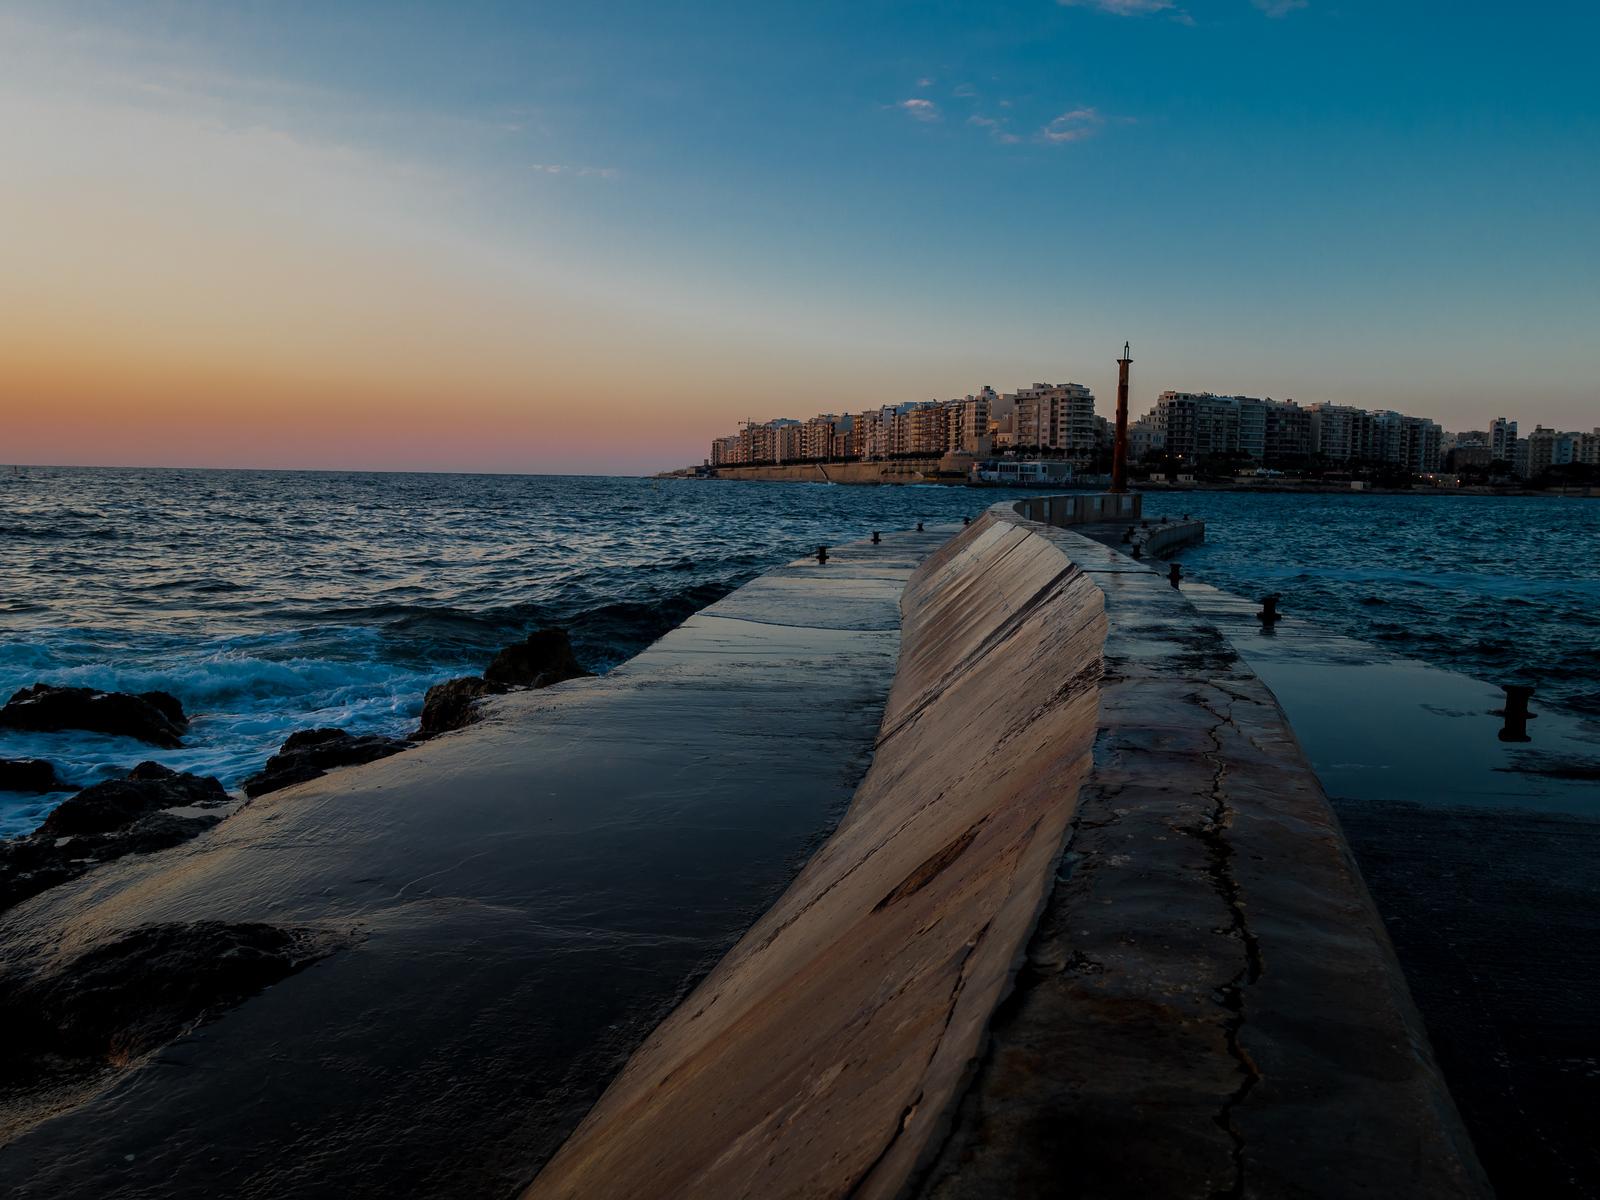 Malta Pictures - sunrise in St Julians